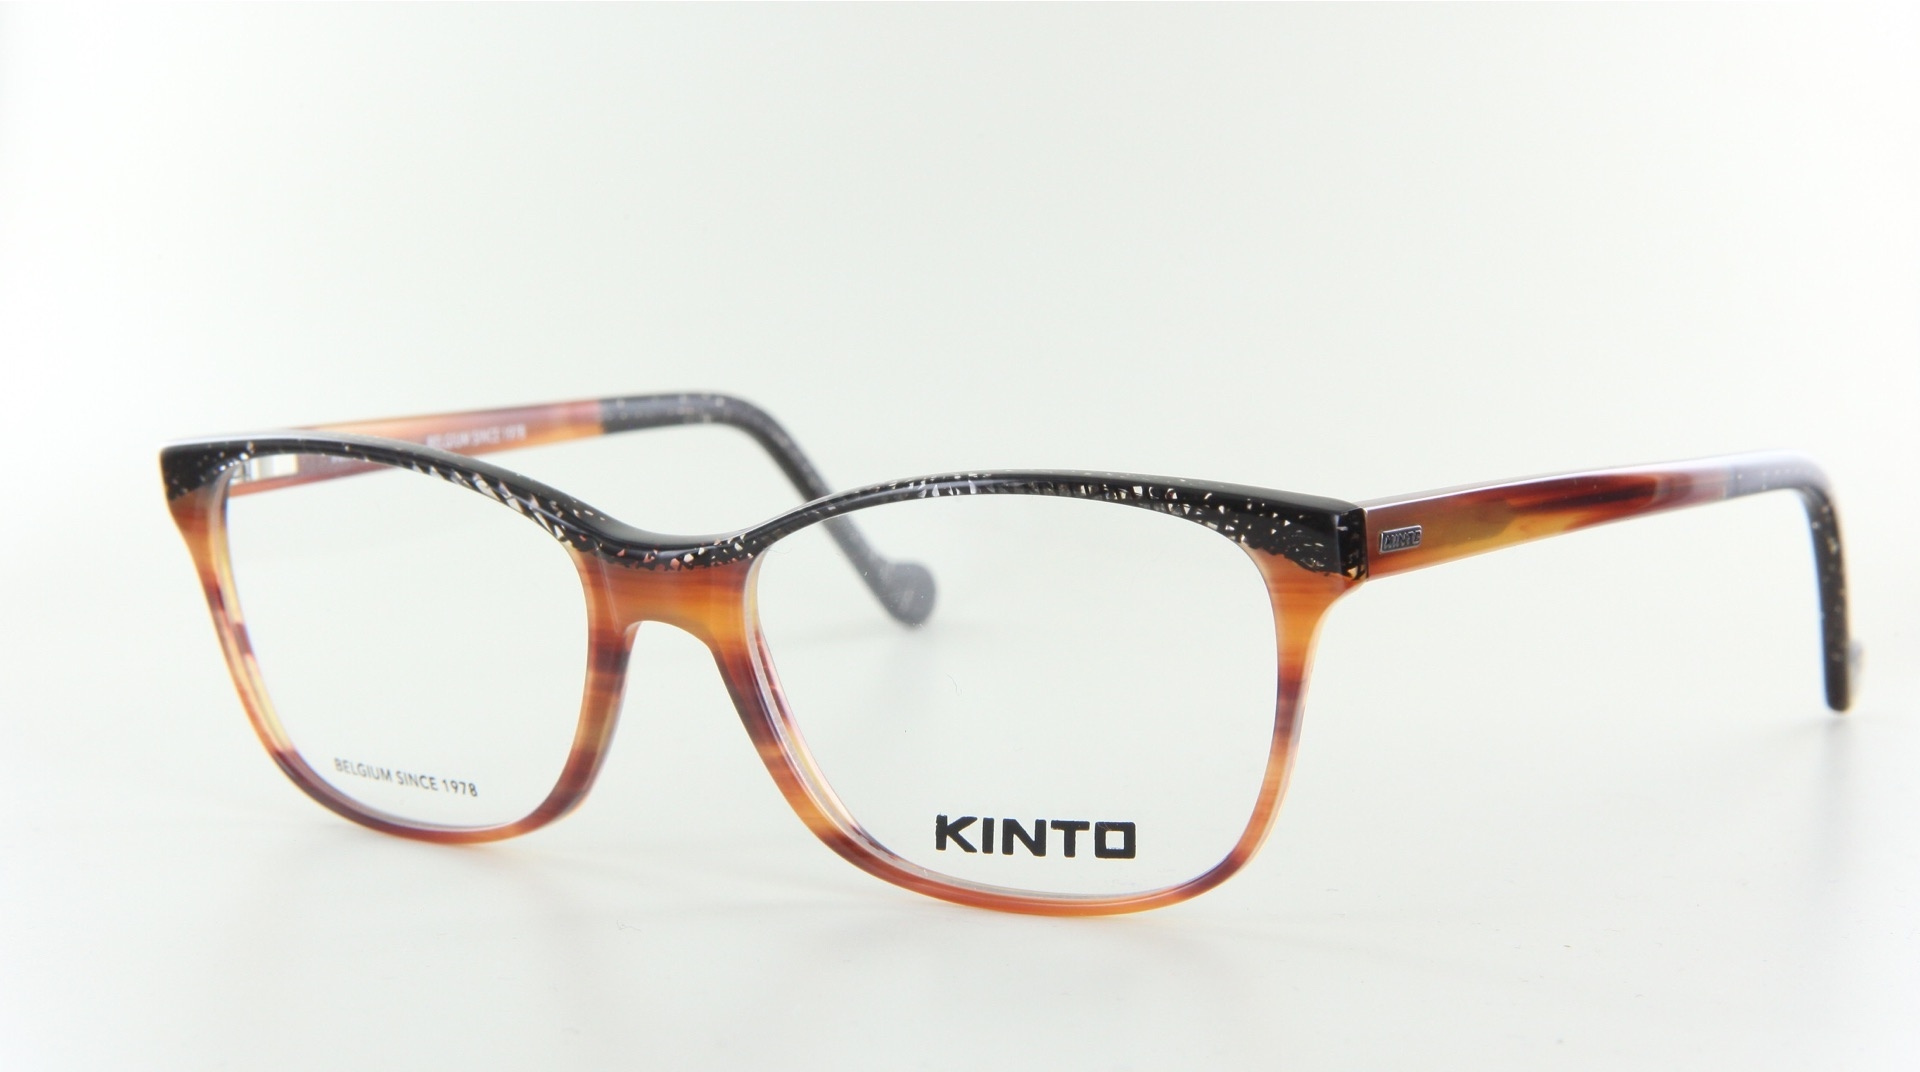 Kinto - ref: 75086